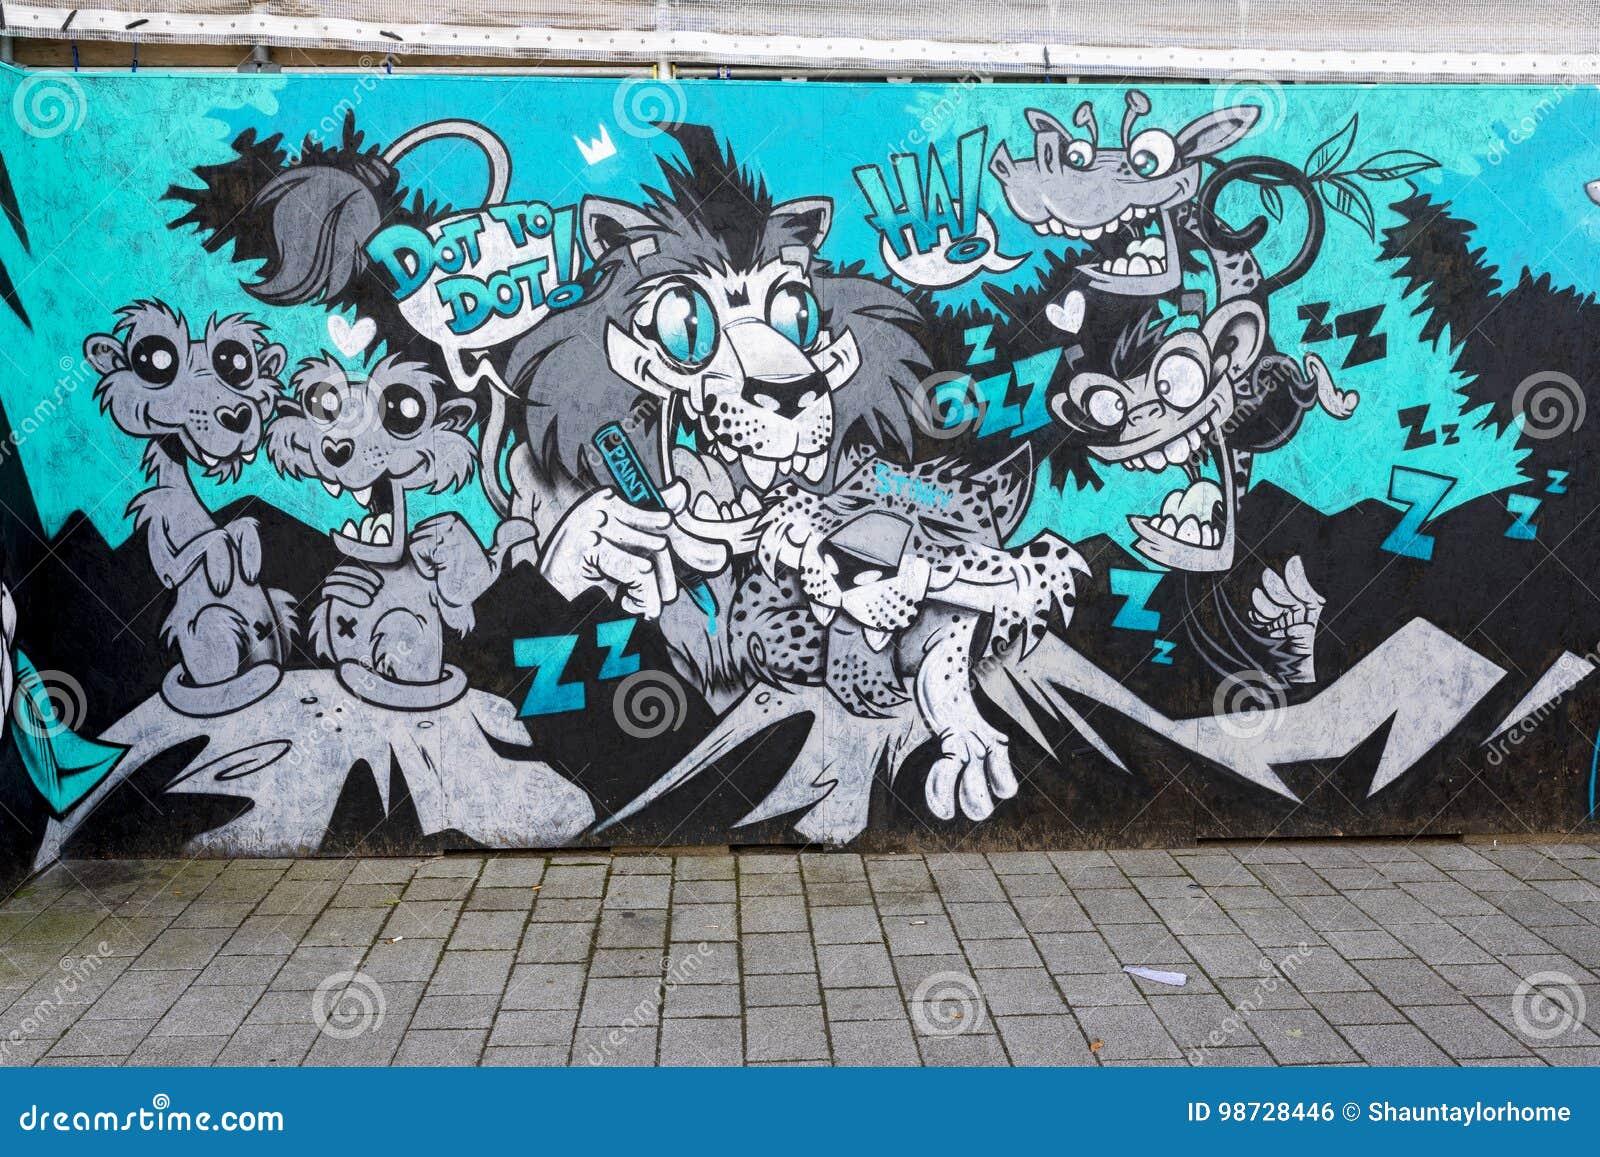 Doncaster street art mural crazy animals